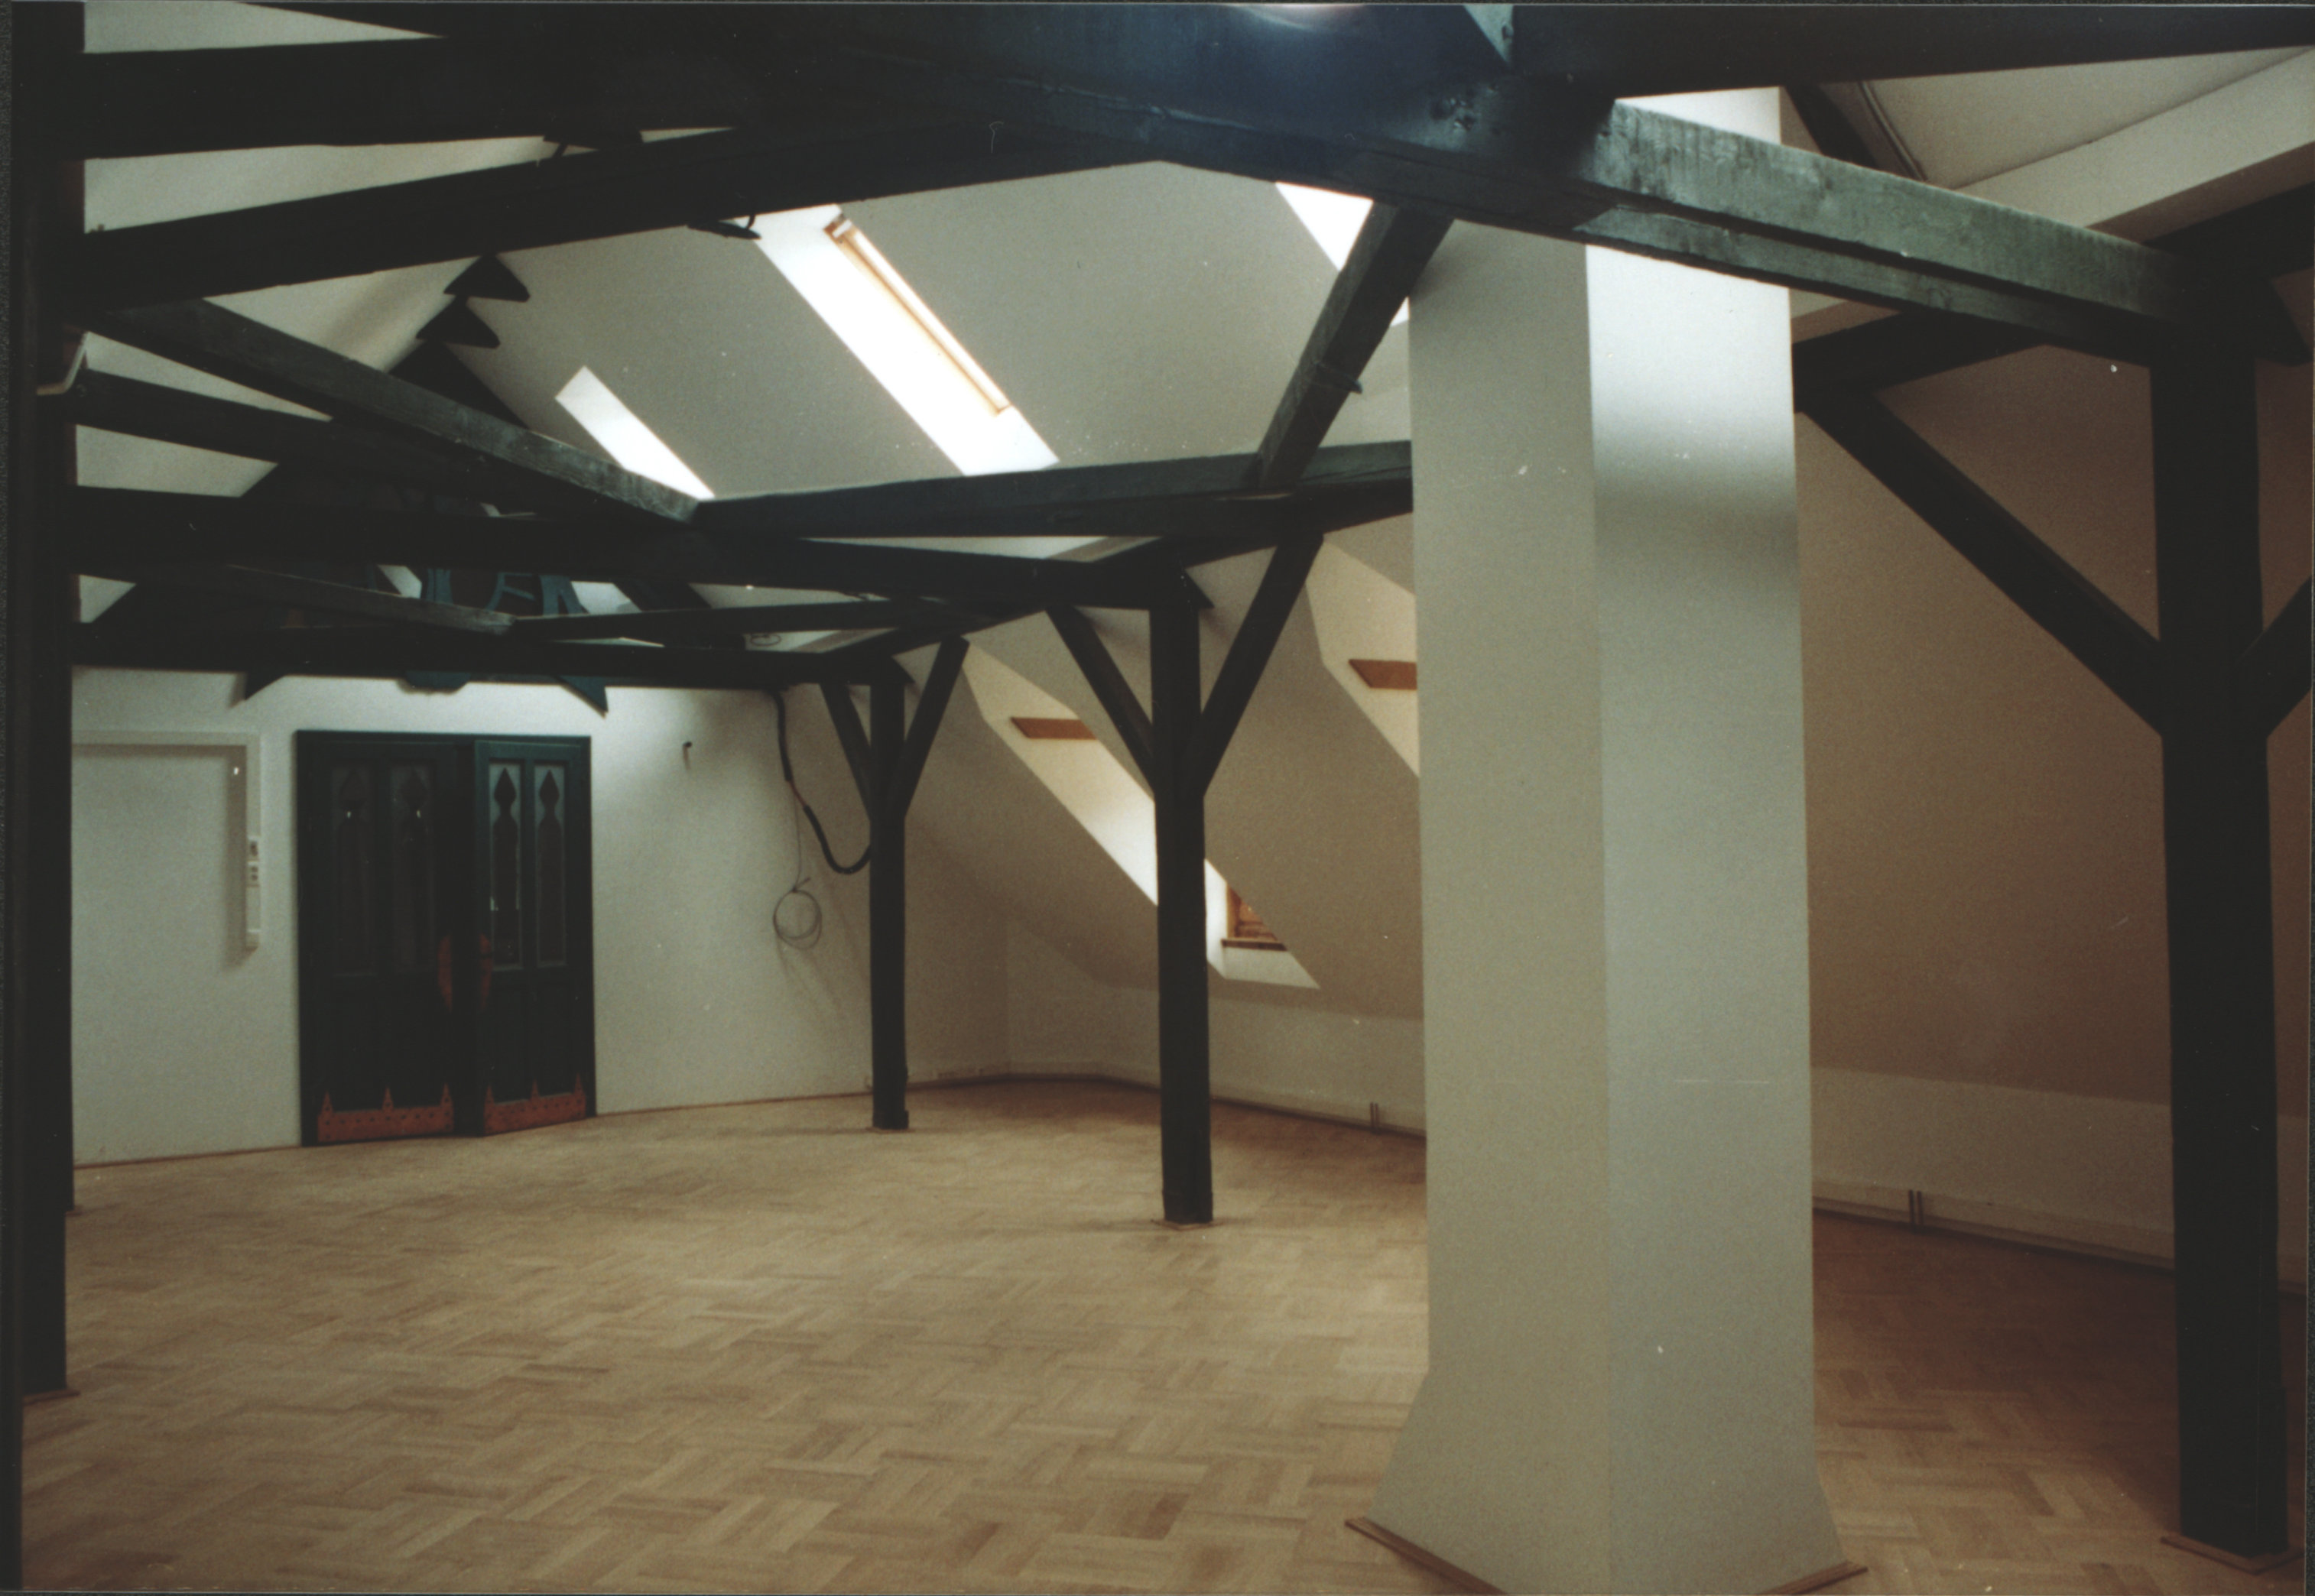 a10_109_duna_muzeum_atepitese_ii_utem_1999_05_17-1999_09_21_2.jpg